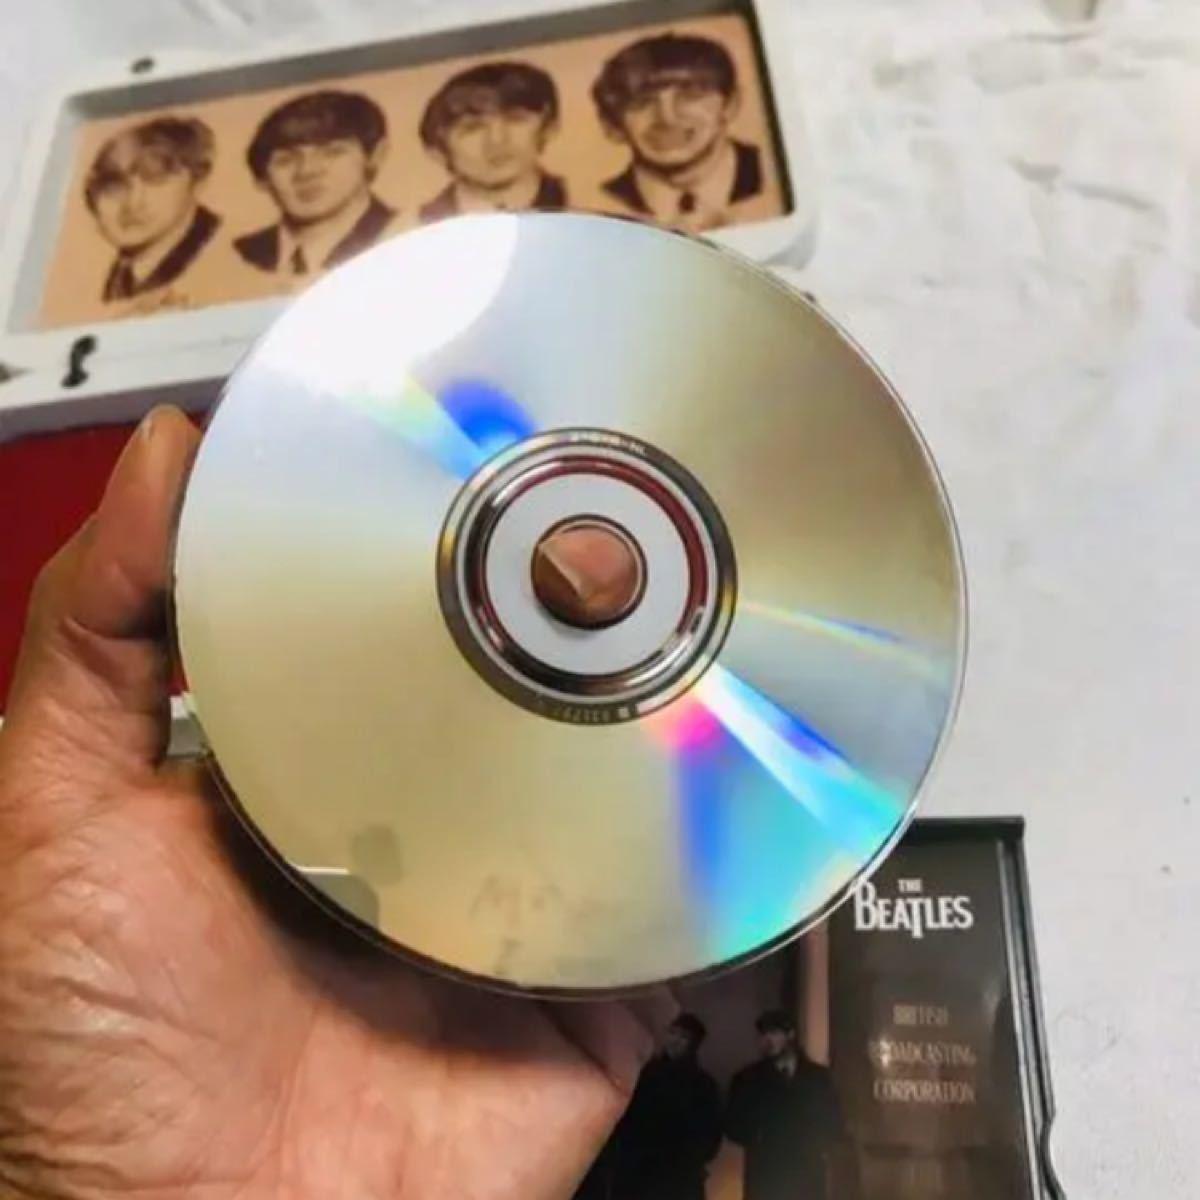 The Beatles live at bbc 世界限定7000個 BOX